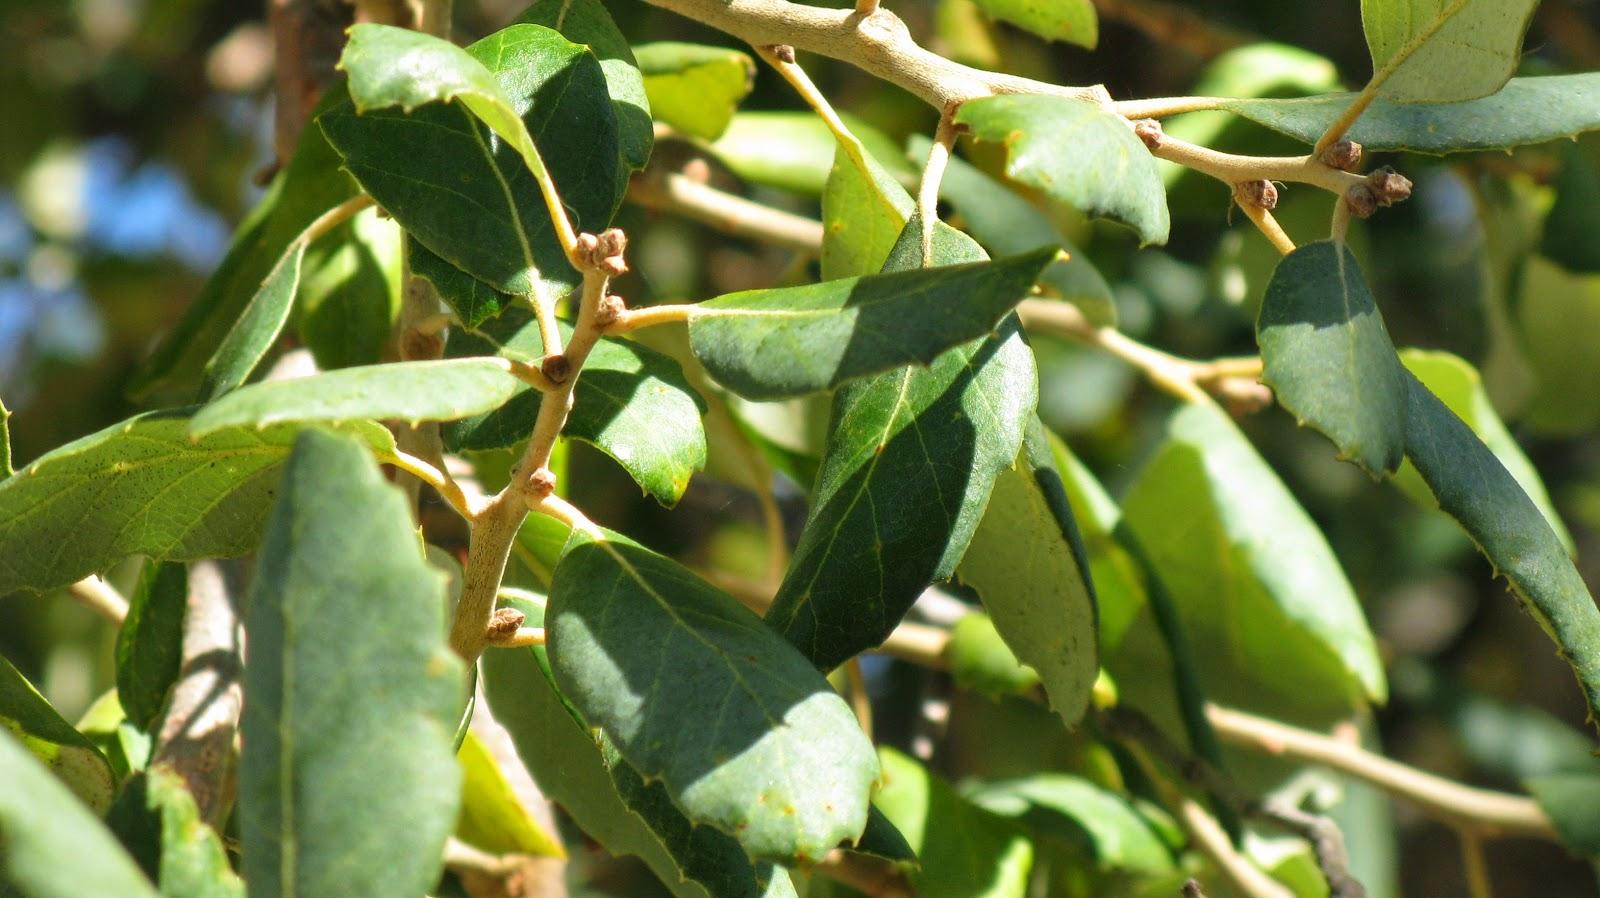 Trees of Santa Cruz County: Quercus suber - Cork Oak